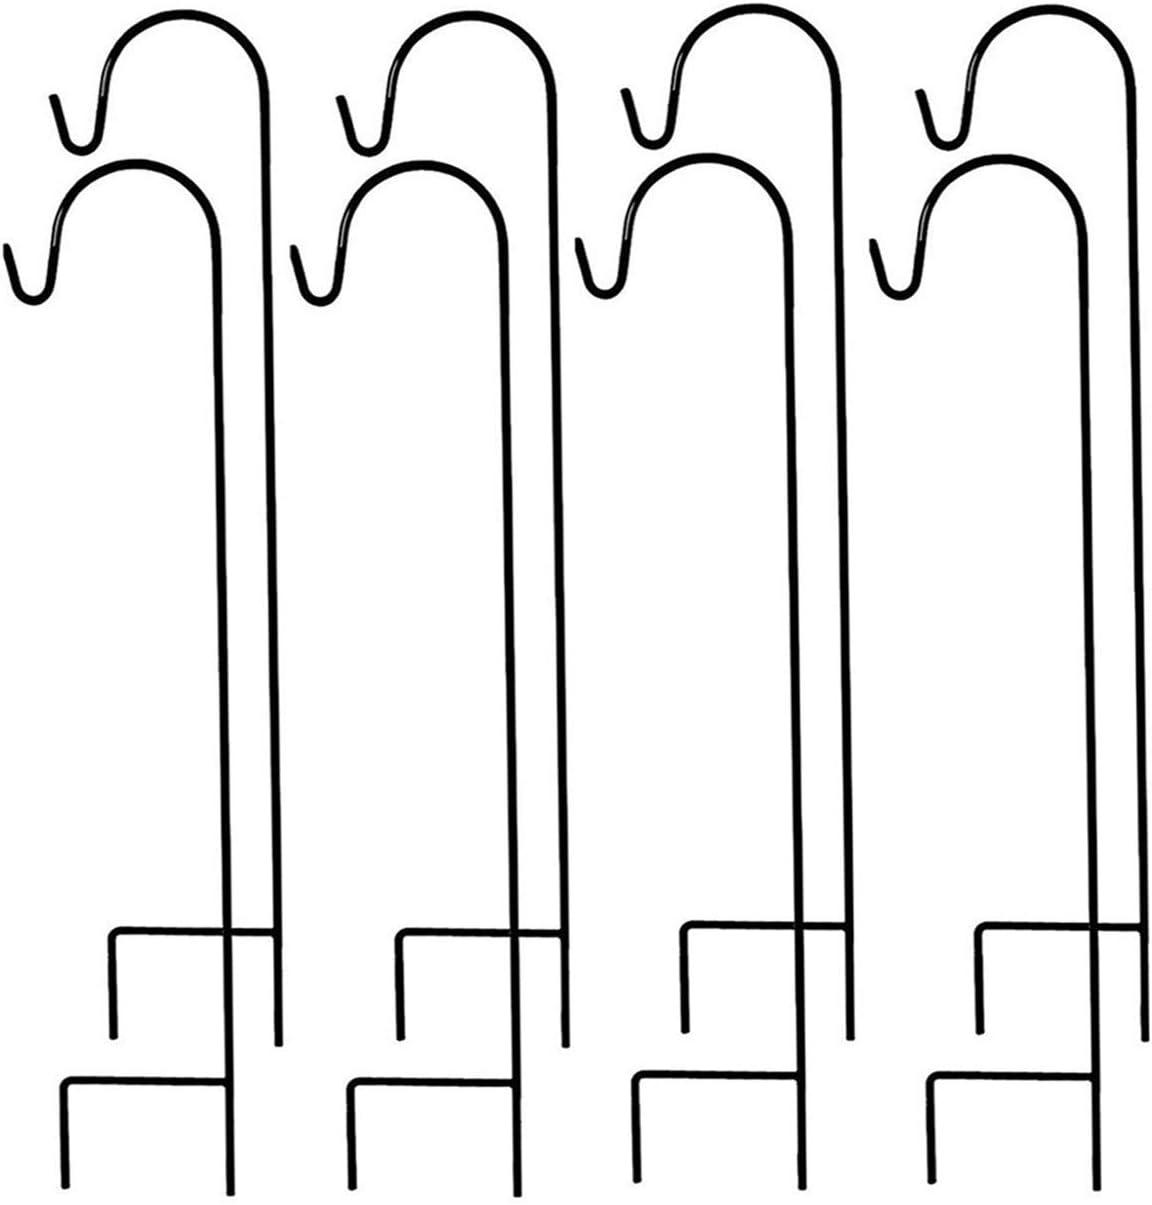 MTB Shepherds Hook 35 Inch by 9.5 Inch, Black, Pack of 8,Strong Rust Resistant Steel for Hanging Planter, Bird Feeders, Lanterns, Solar Lights, Mason Jars,Hummingbird Feeder